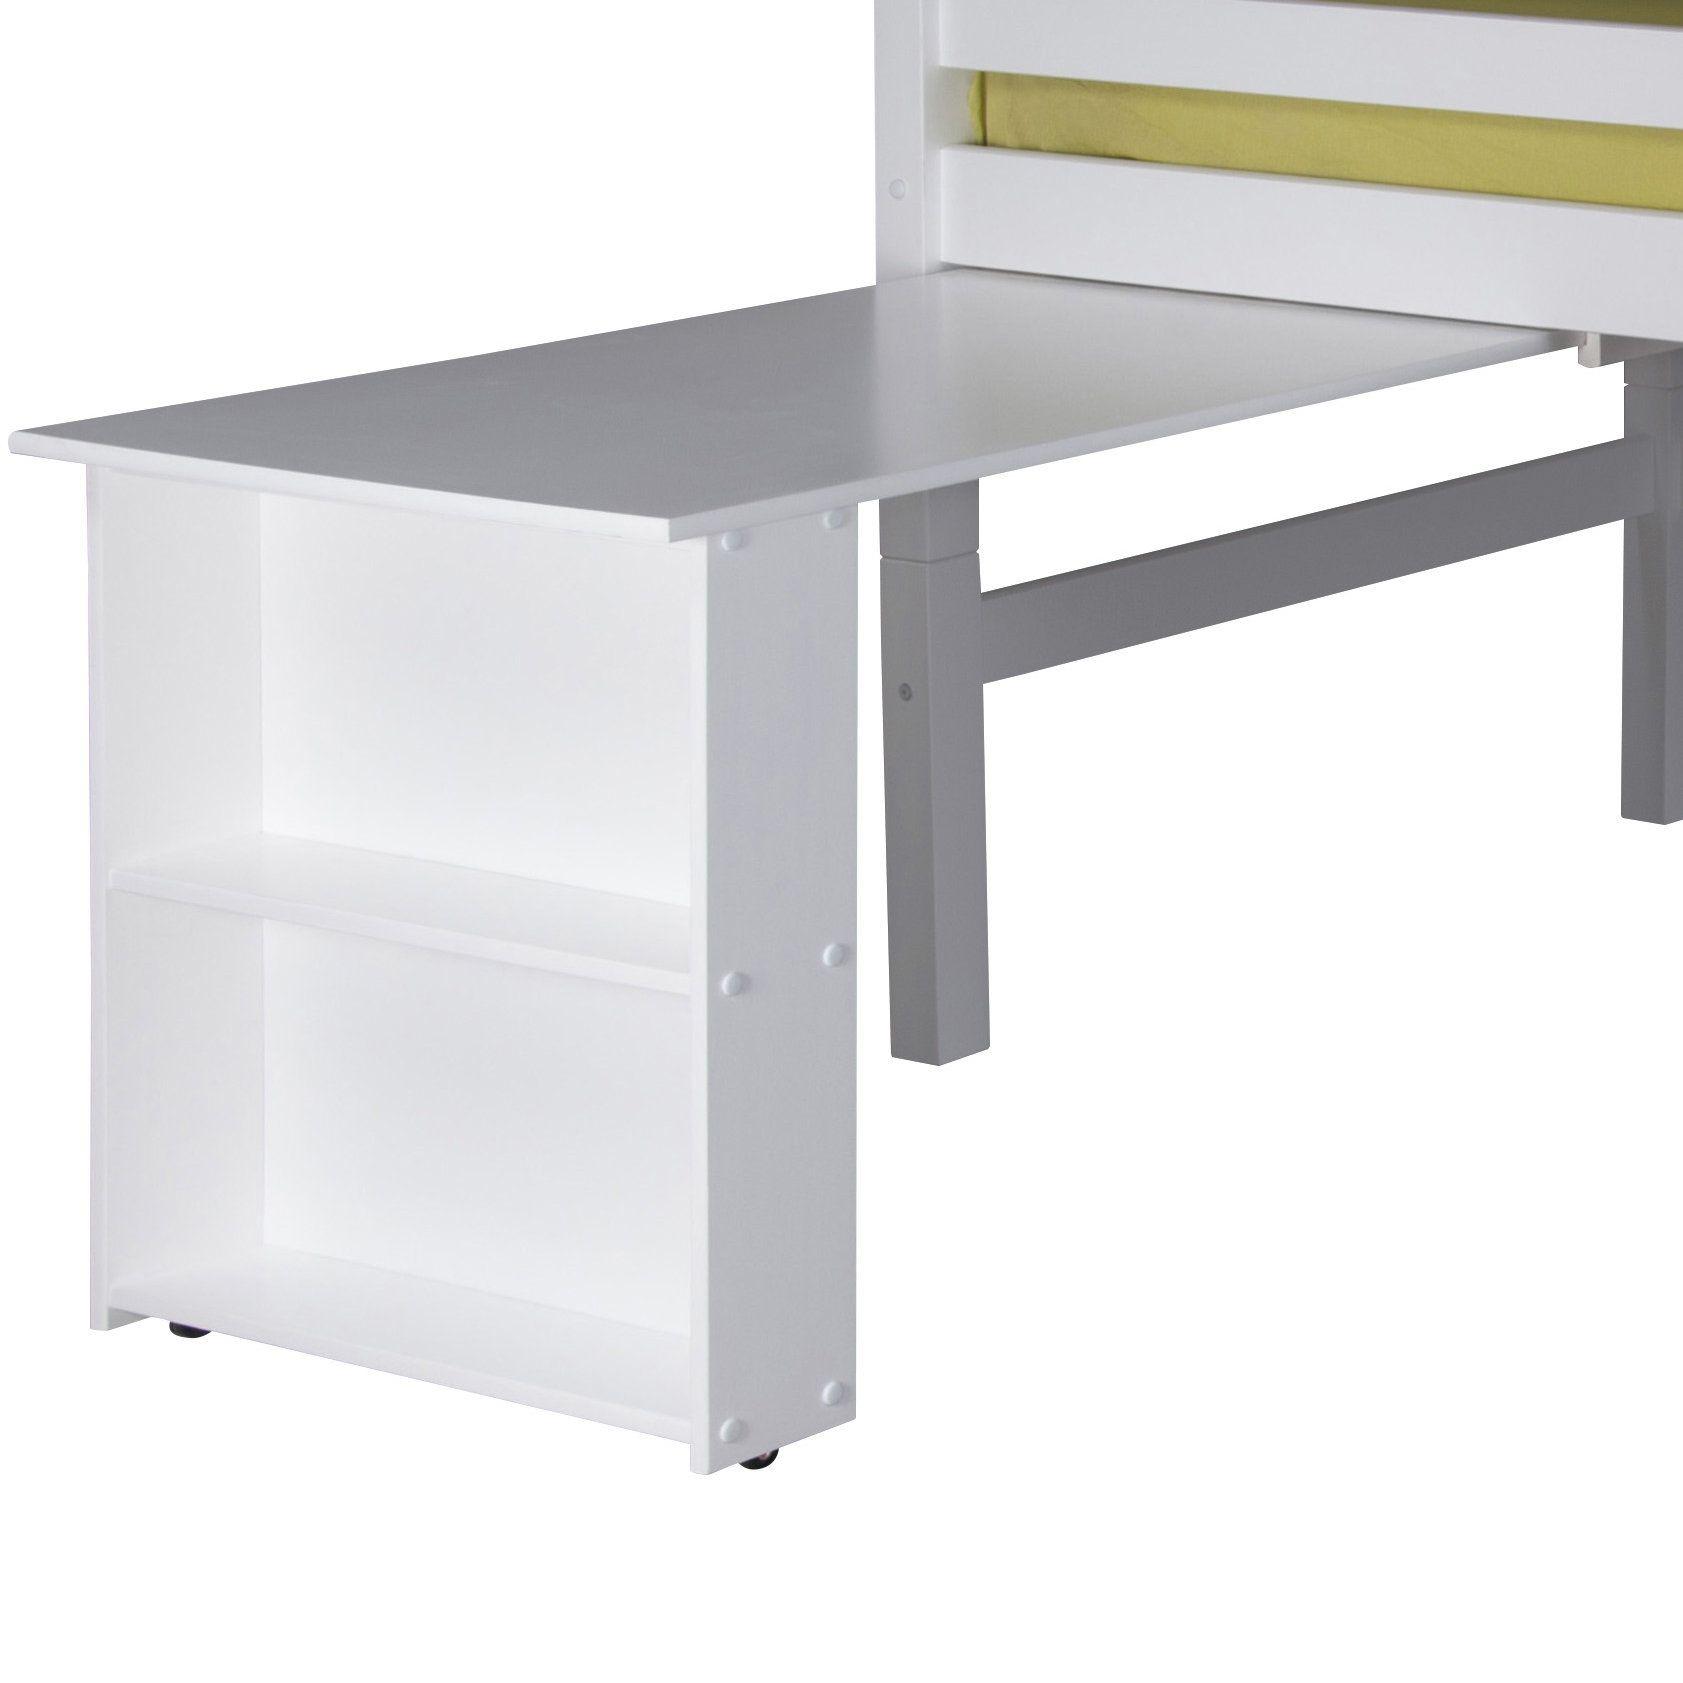 Isabelle Low Loft Bed Retractable Desk Products Low